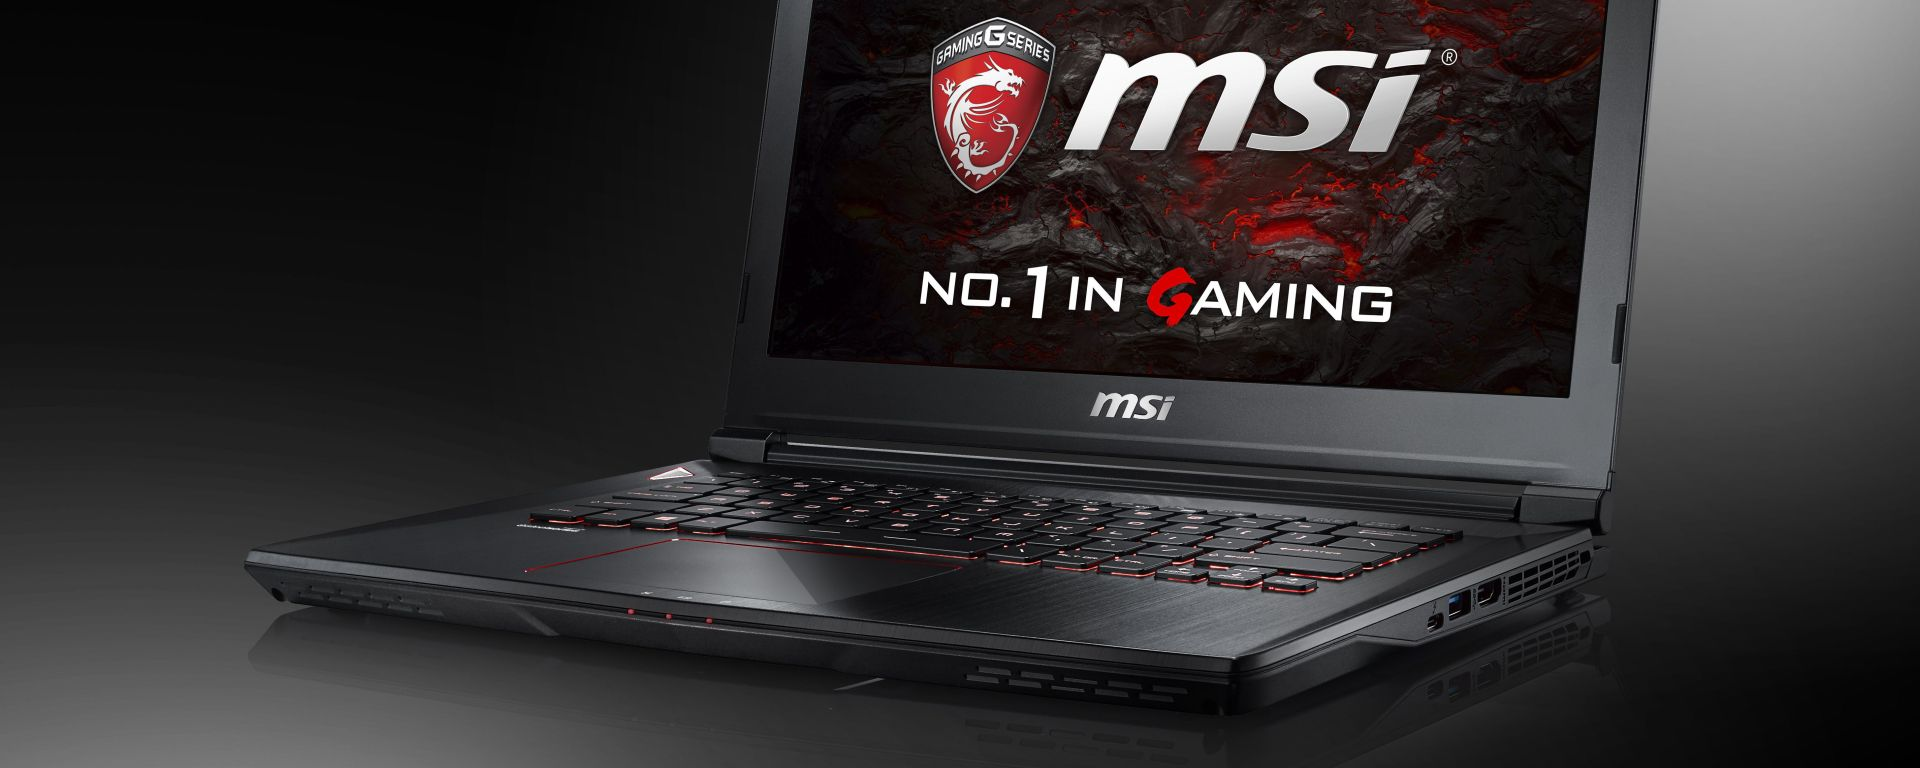 MSI GS 43 VR Ready - Nvidia serie 10